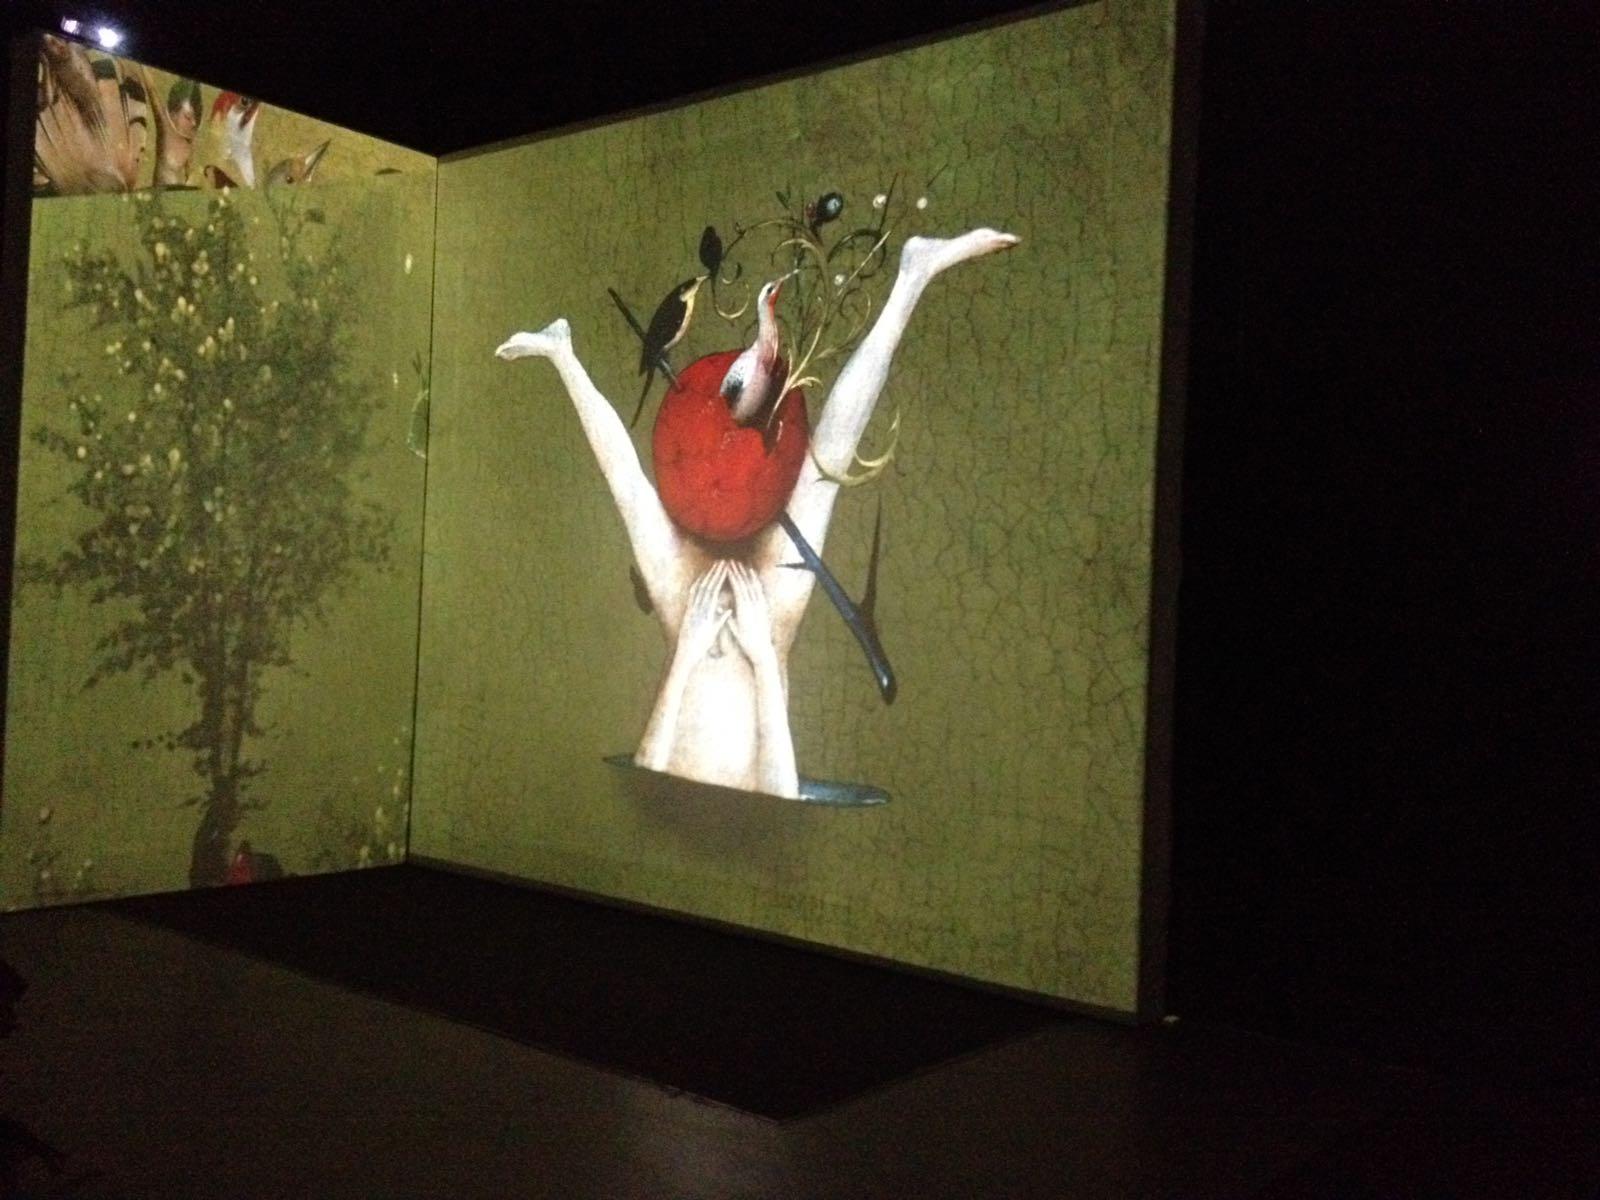 Hieronymus Bosch, mostra audiovisiva.